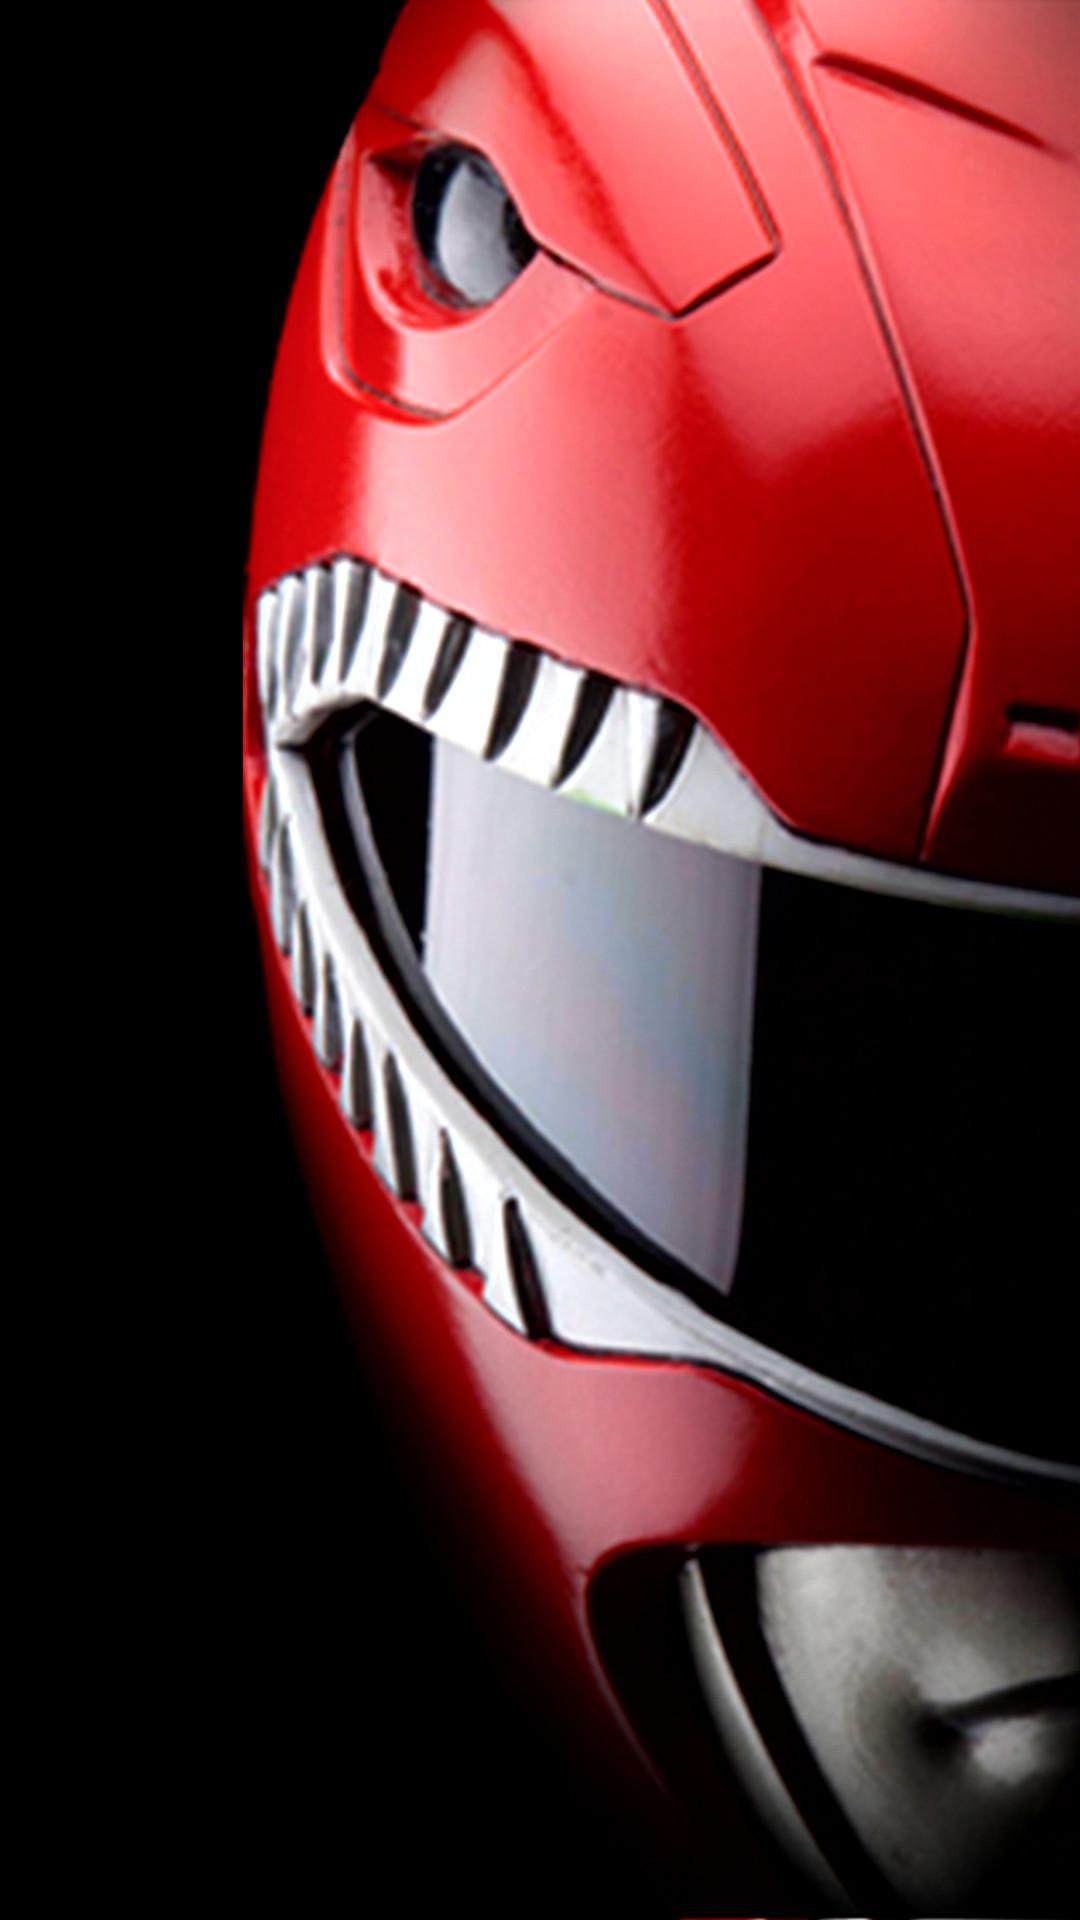 Res: 1080x1920, Power Rangers Phone Wallpaper